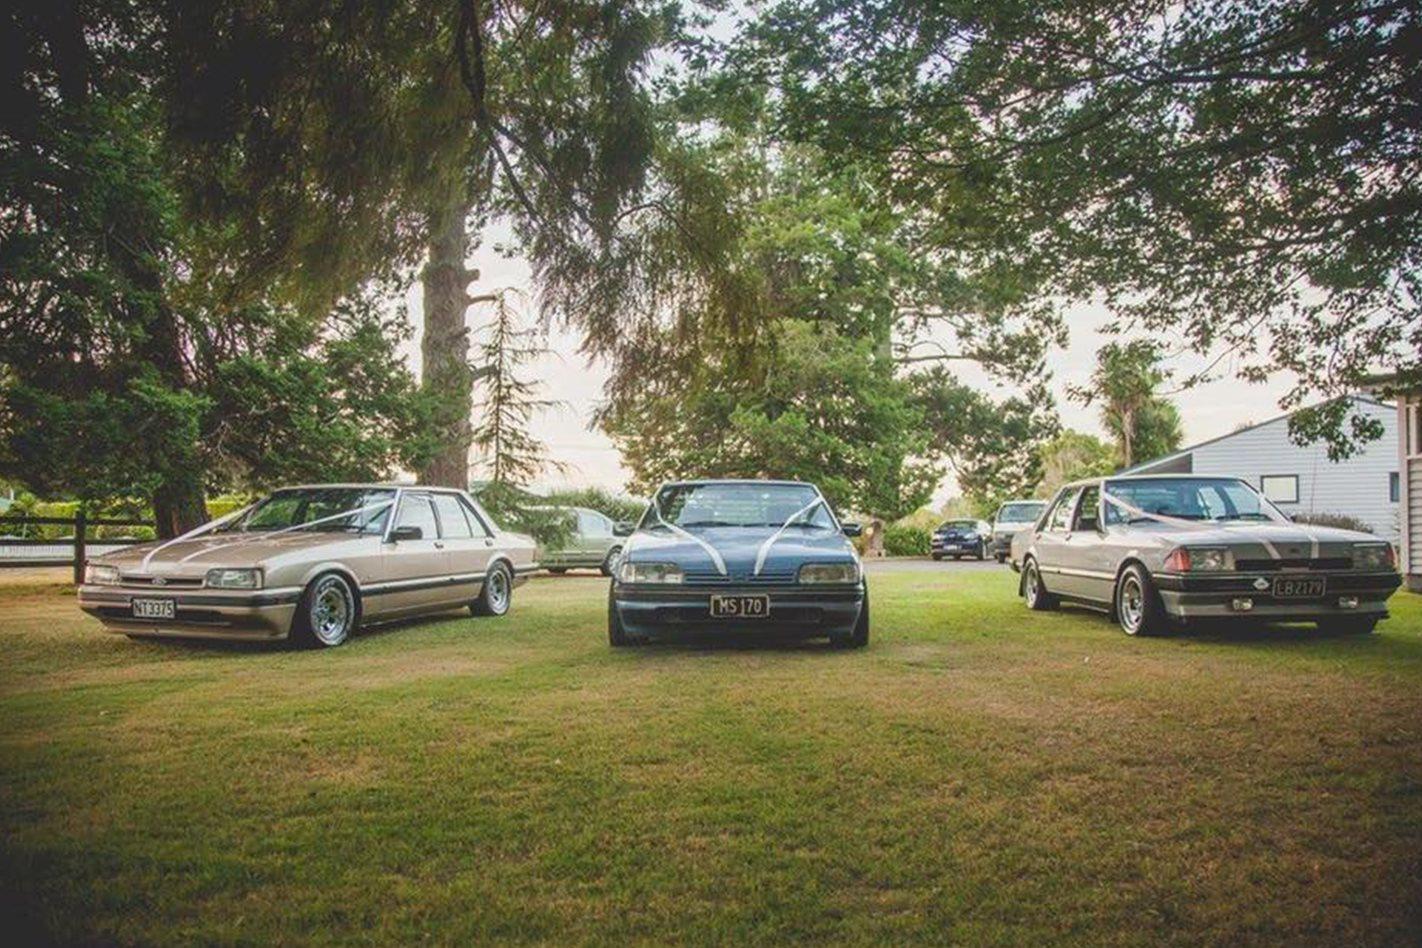 Kelsay Garaway's Falcon wedding cars